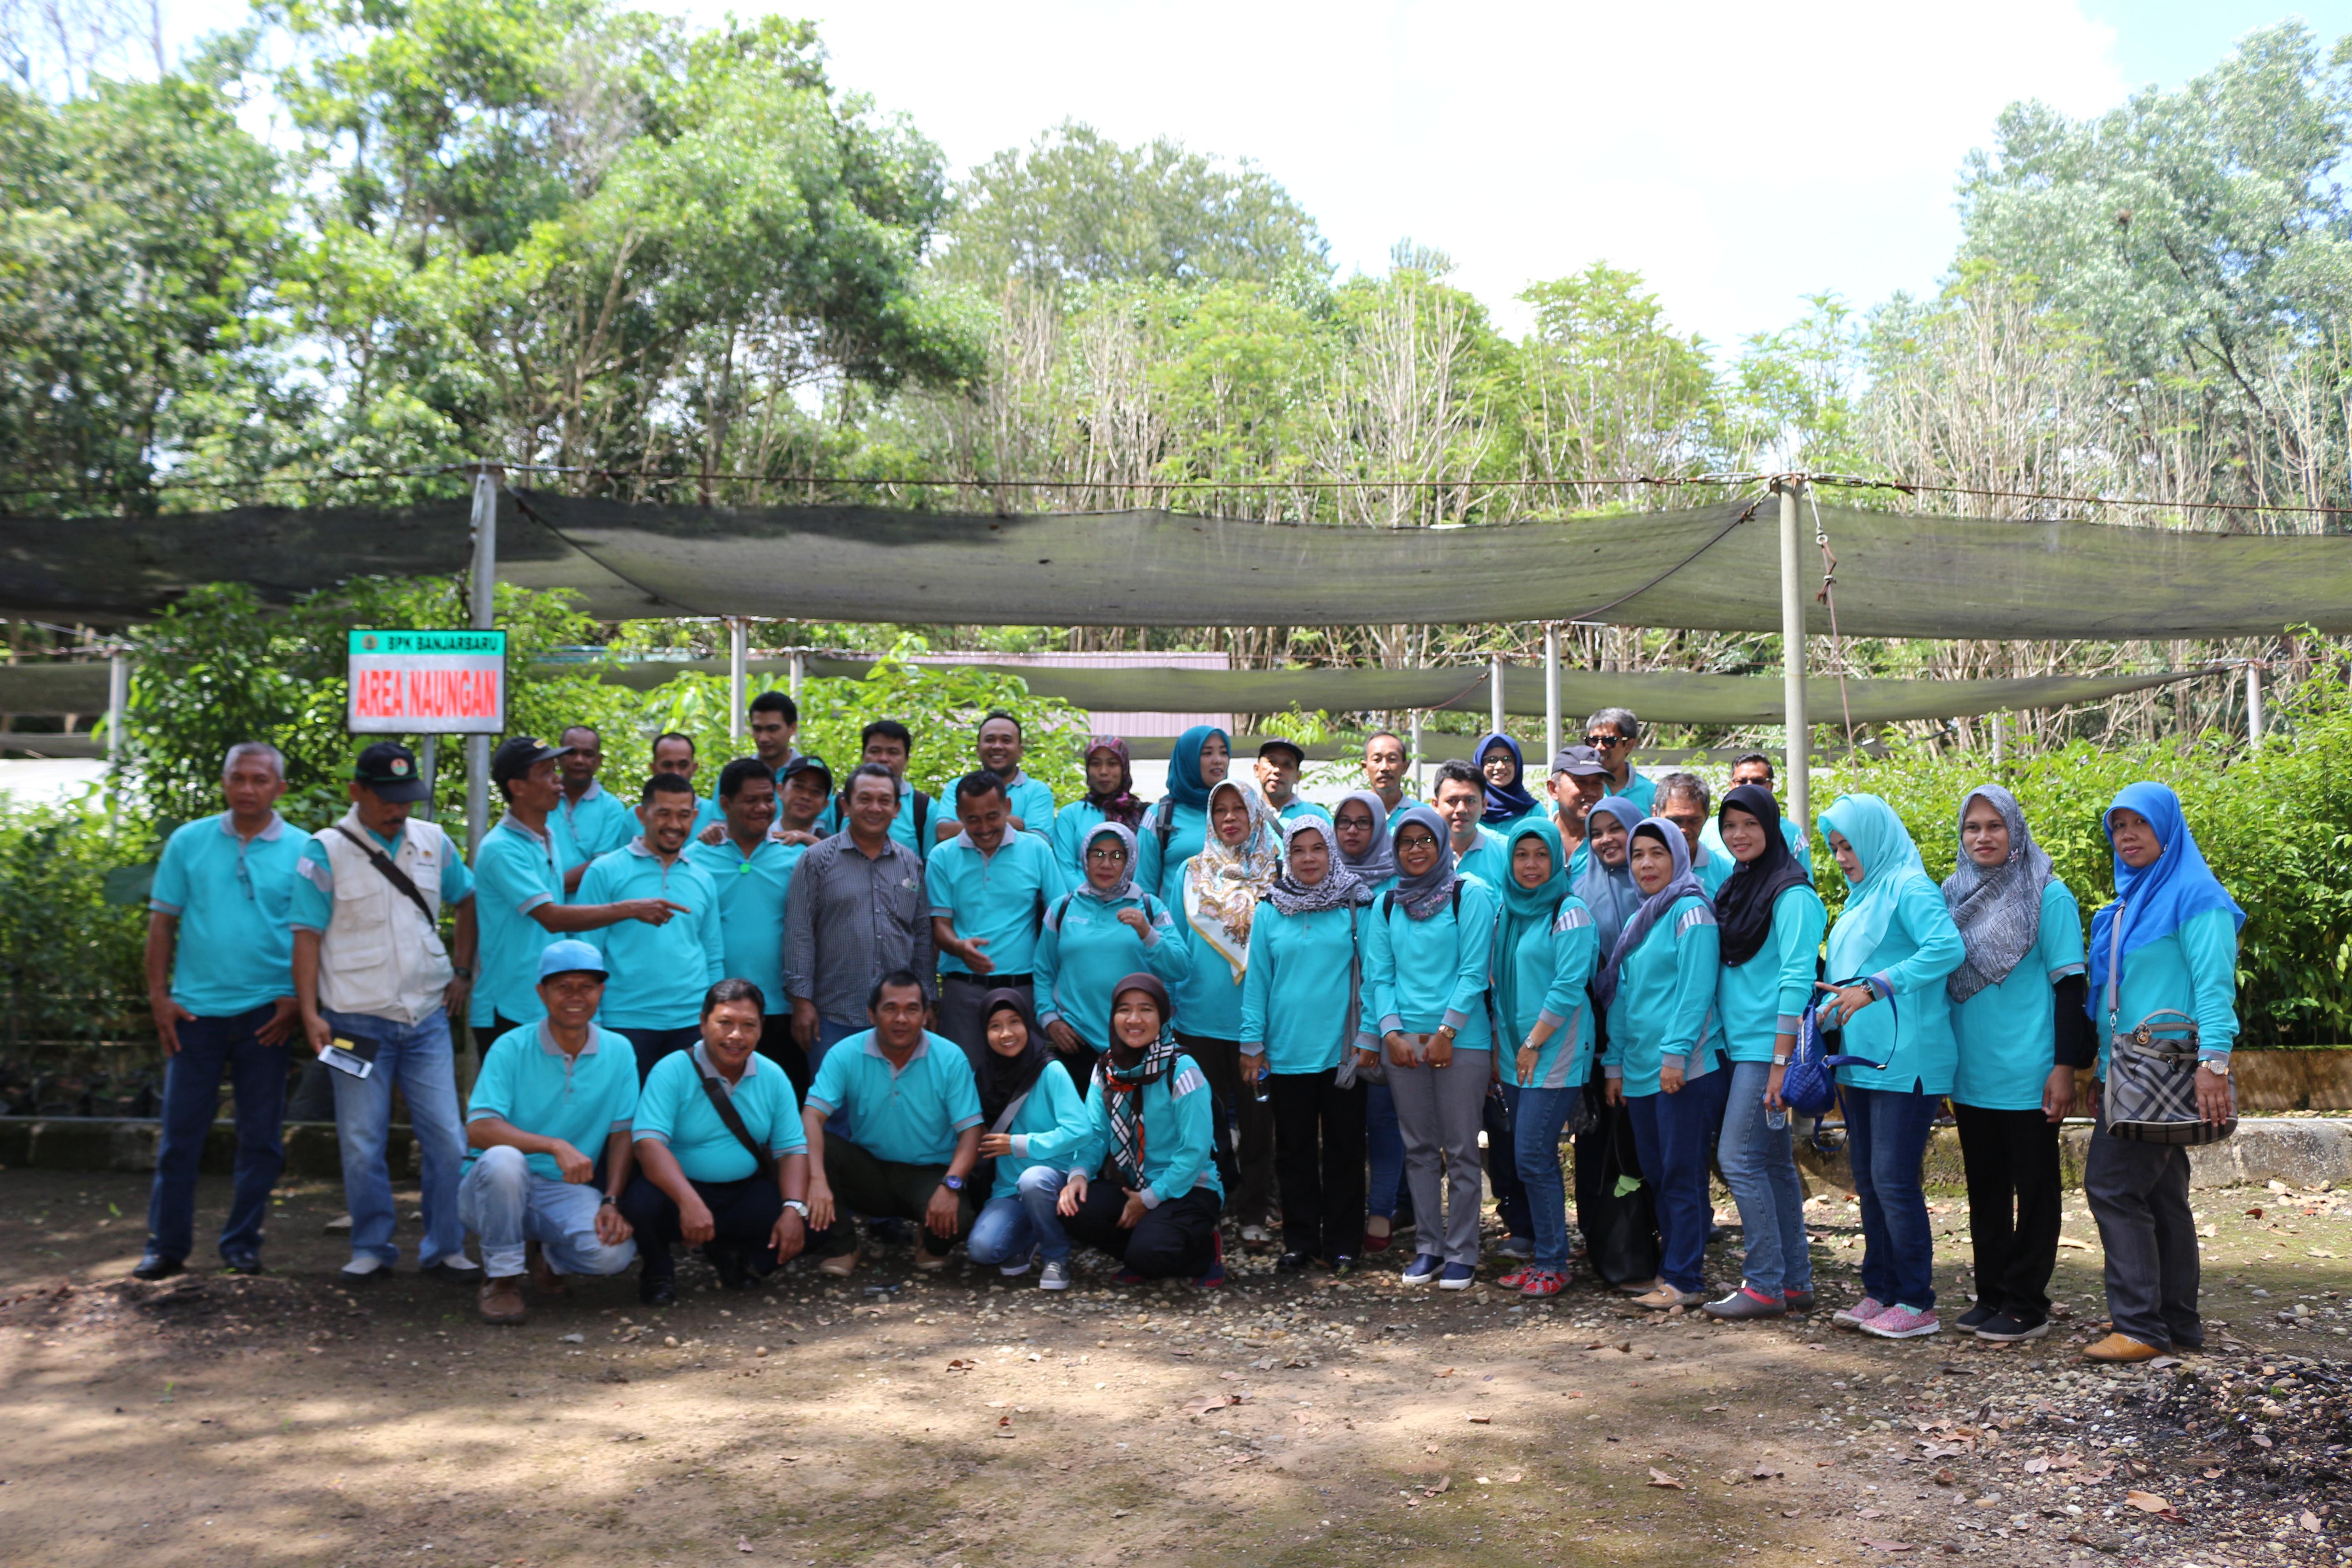 Penyuluh Kehutanan Kalsel Belajar Teknik Pembibitan Stek Pucuk di BP2LHK Banjarbaru